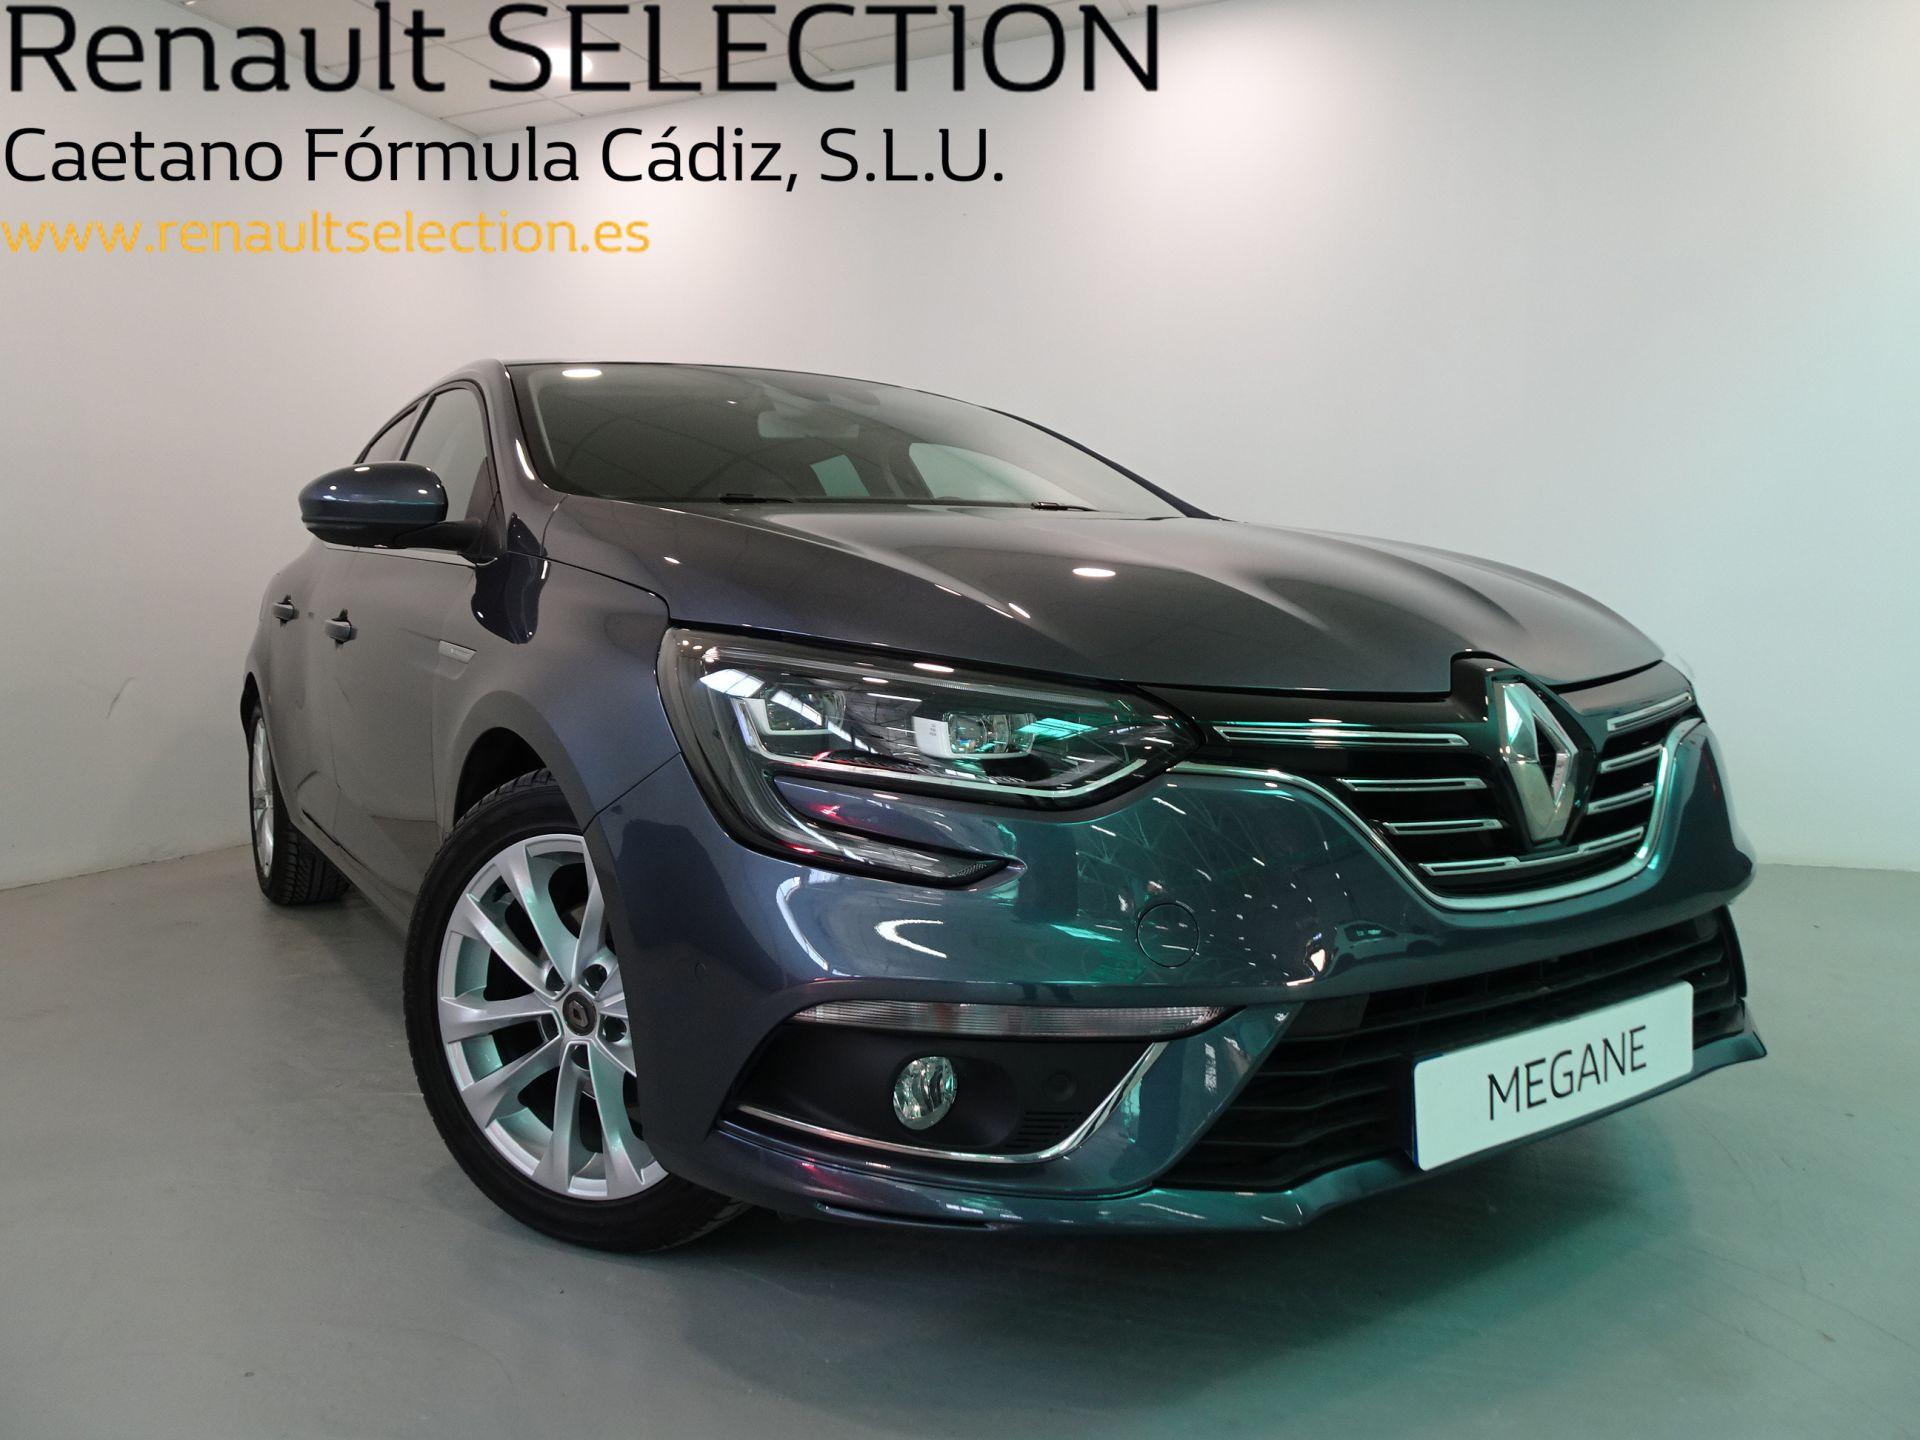 Renault Megane Zen Blue dCi 85 kW (115CV) segunda mano Cádiz